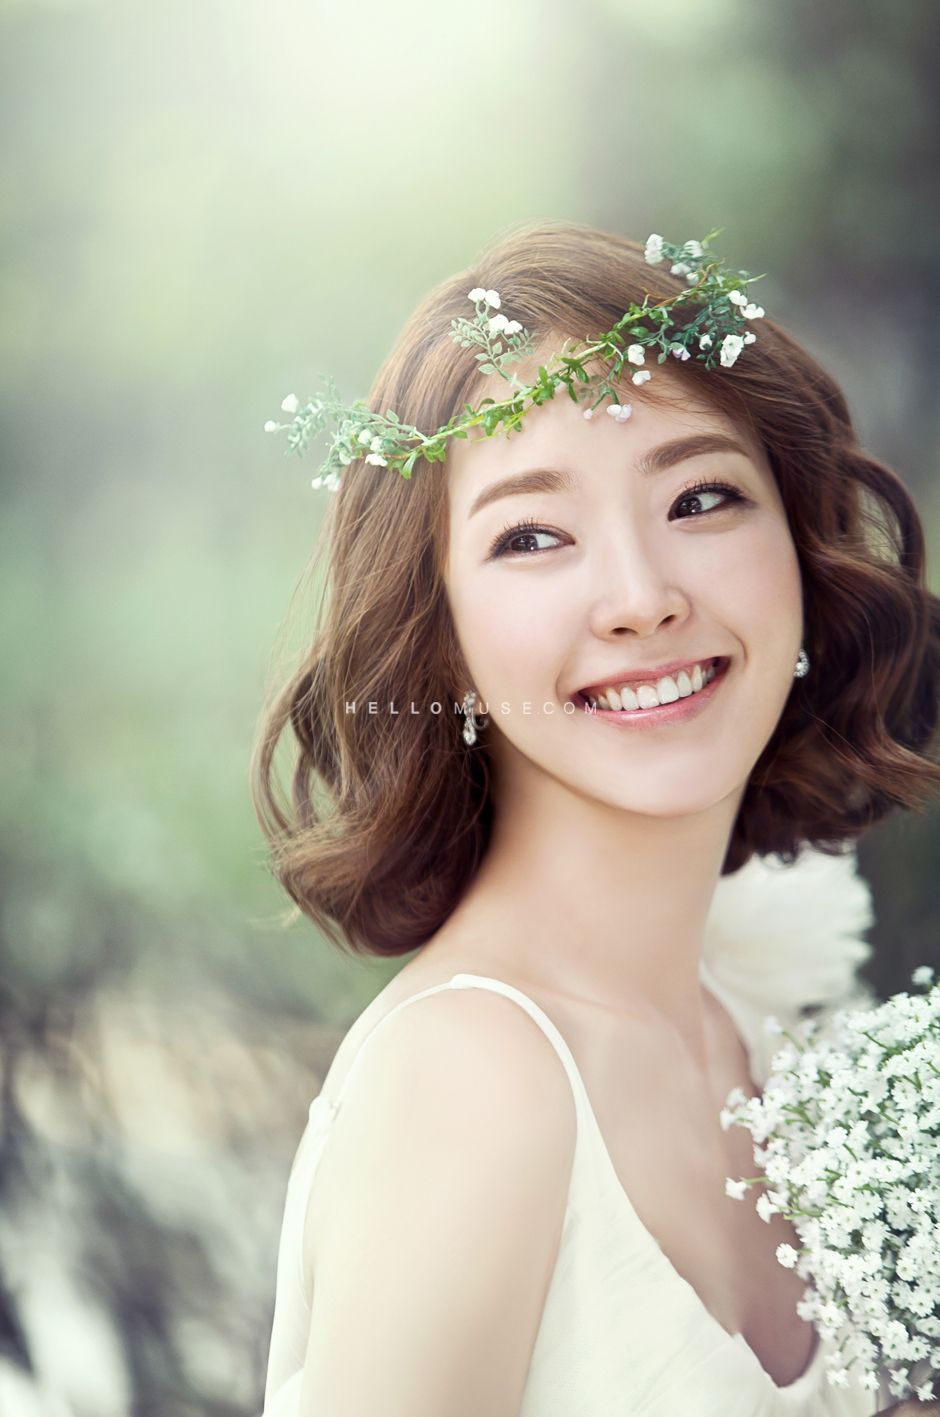 outdoor pre wedding photography in korea, | portraits